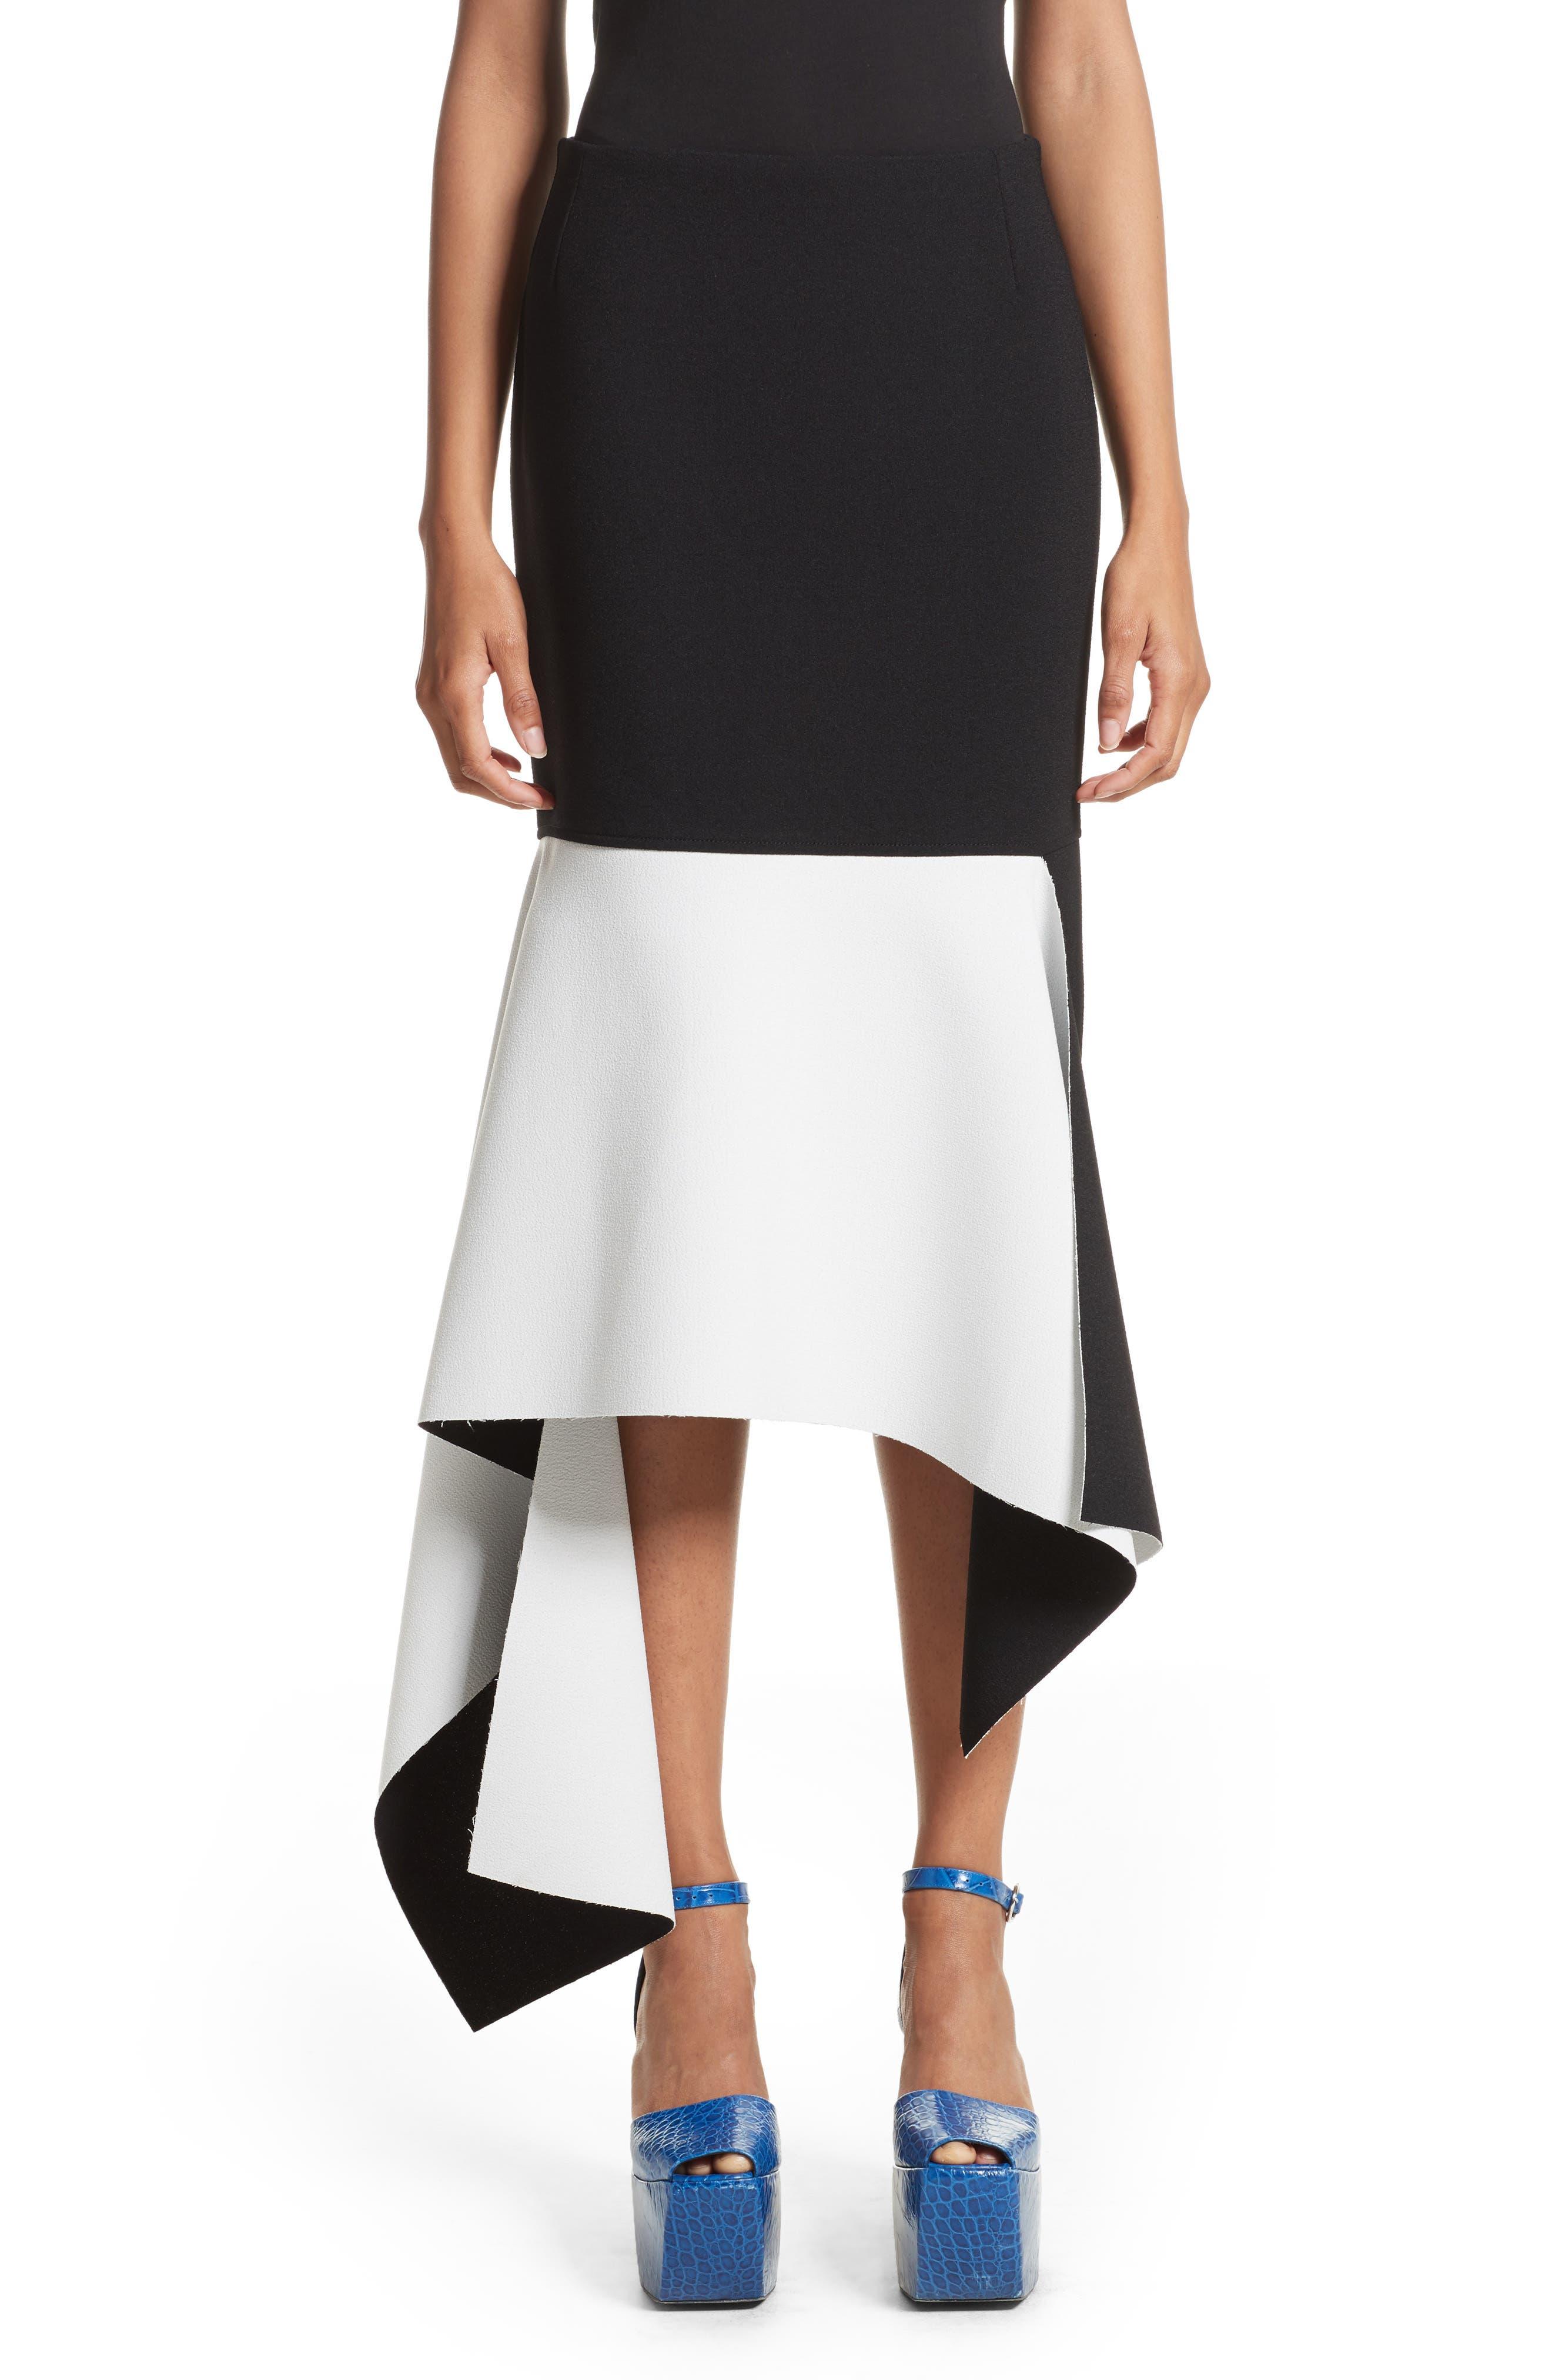 Marques'Almeida Asymmetrical Bicolor Crepe Skirt,                             Main thumbnail 1, color,                             003